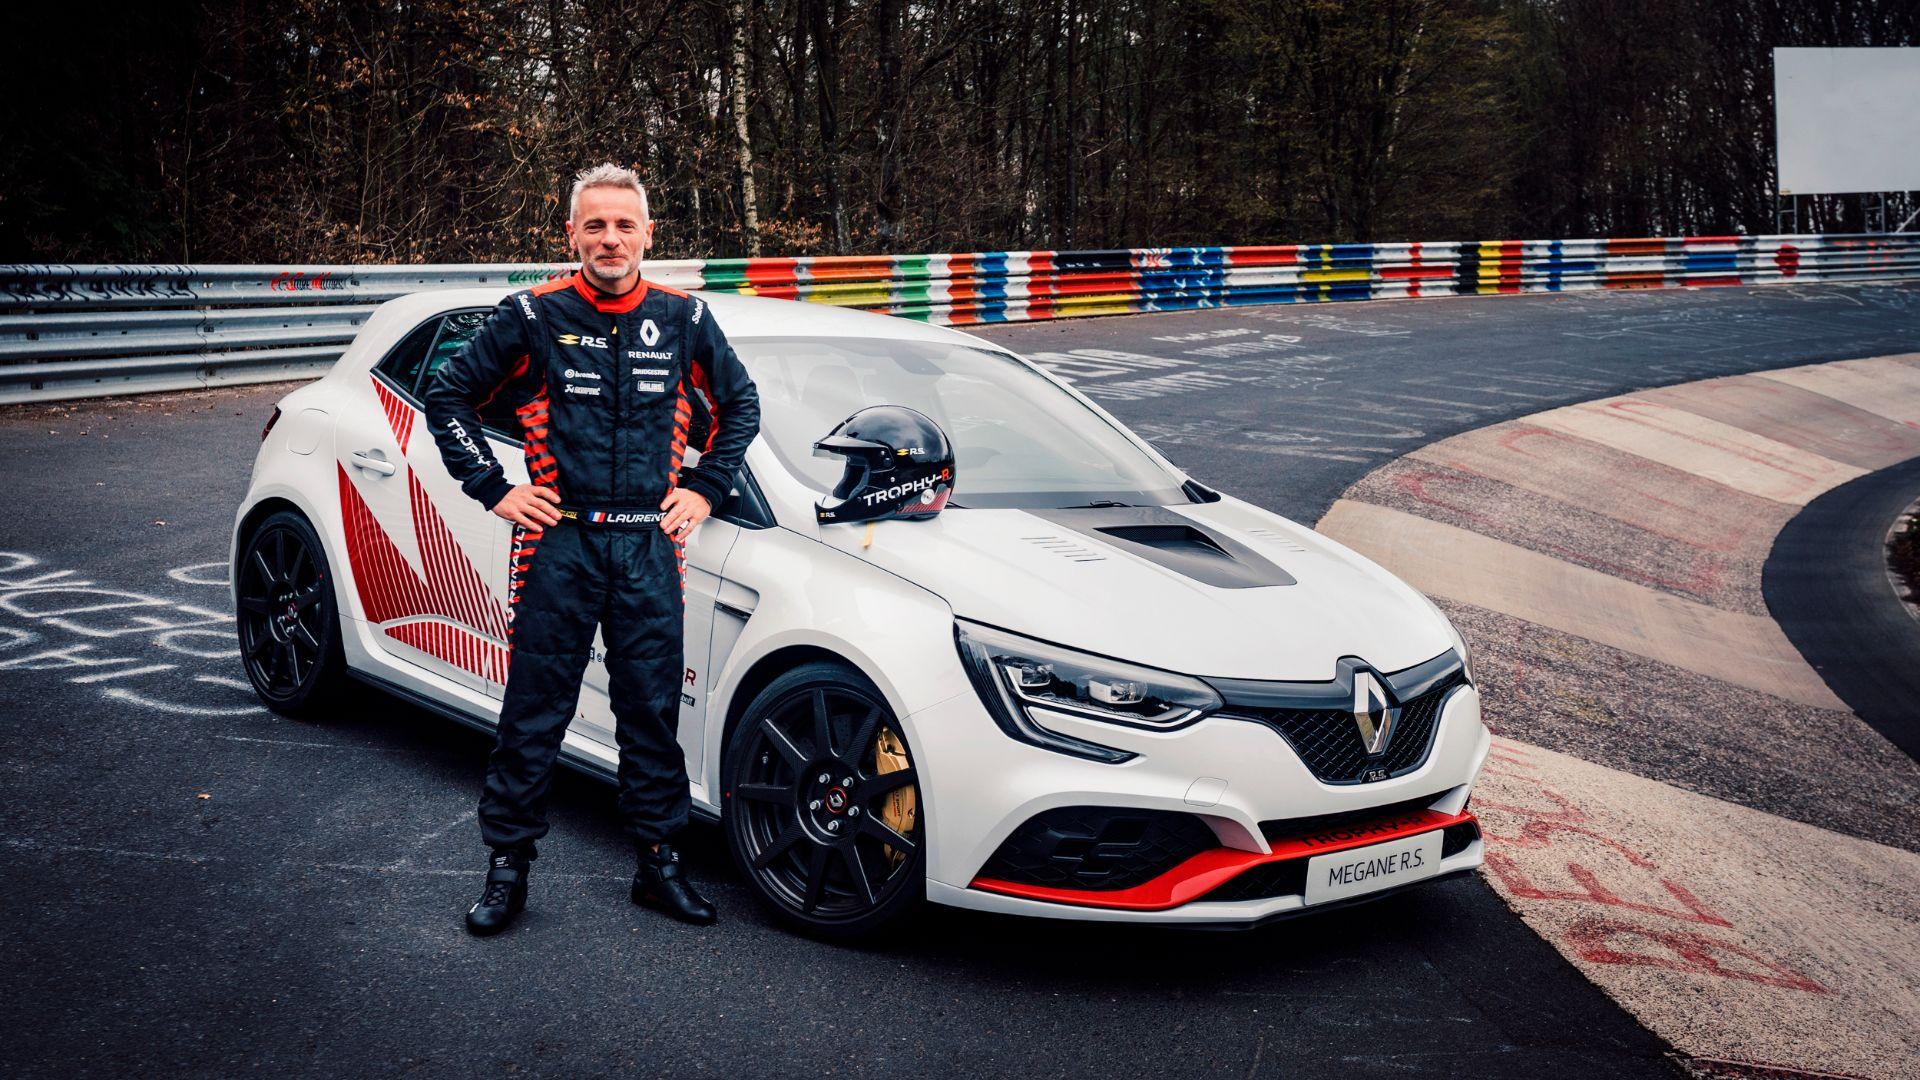 Nurburgring fastest cars 2019